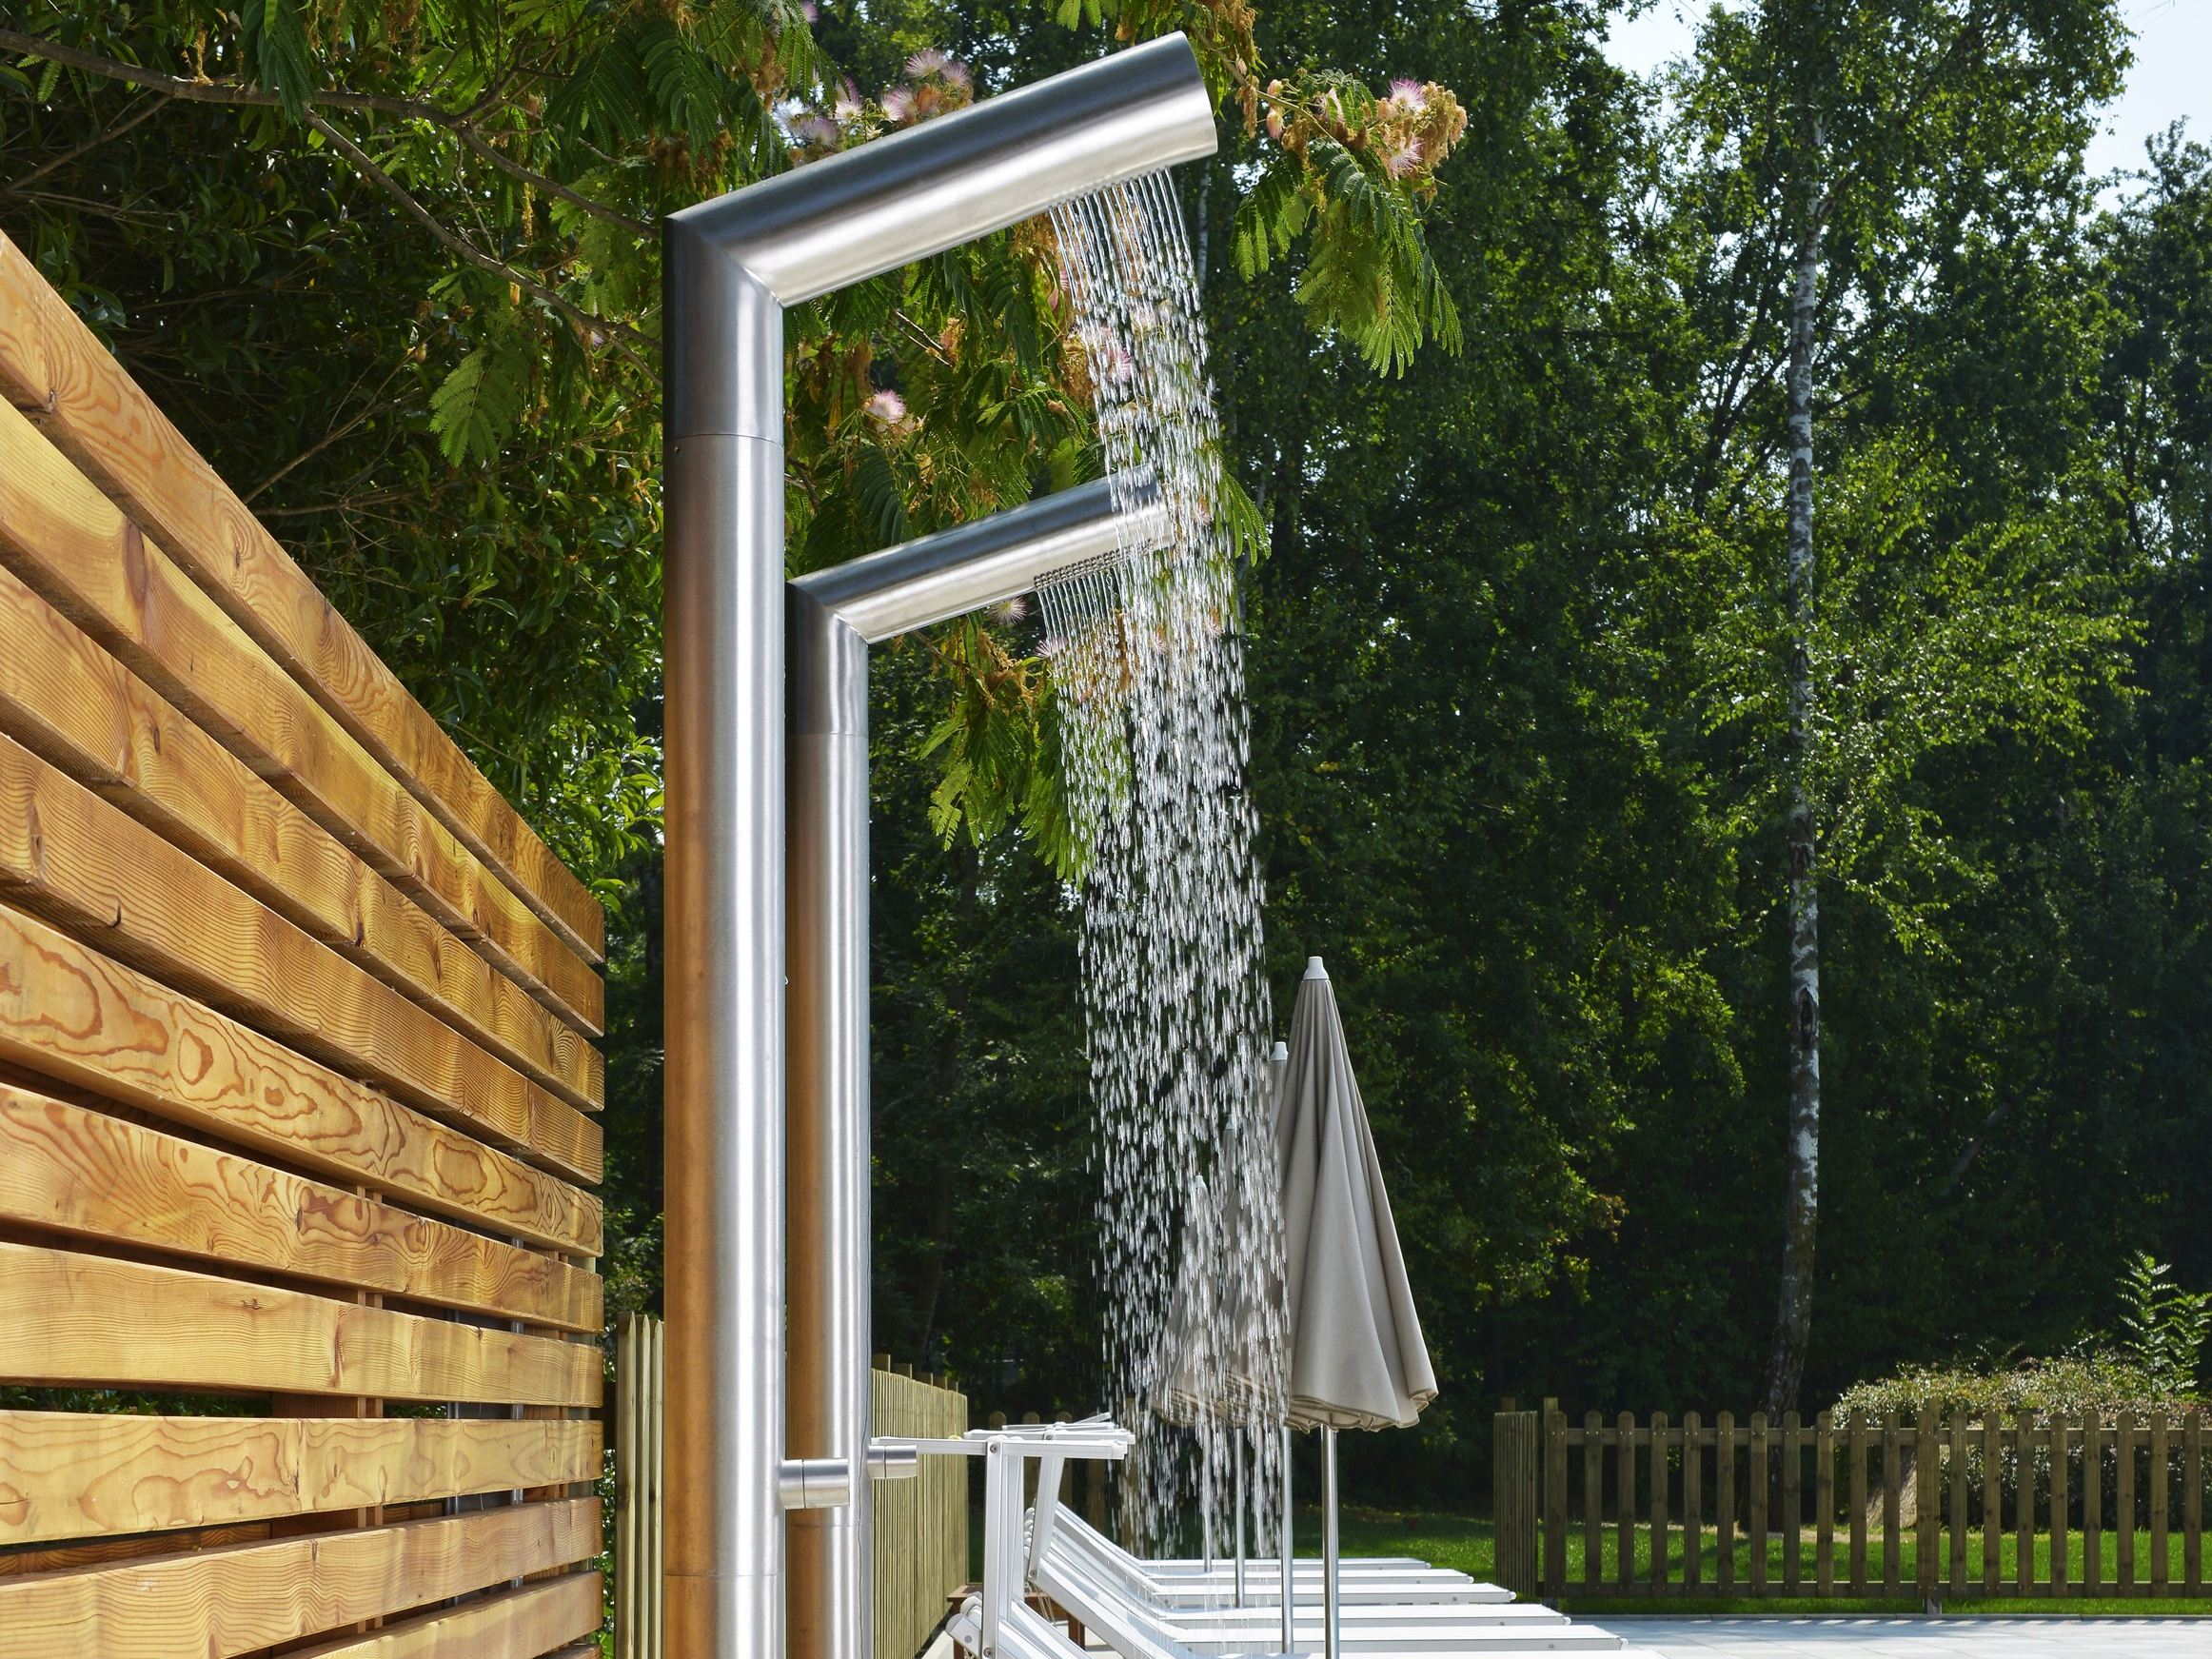 metrix-cristina-stainless-steel-outdoor-showers-1.jpg